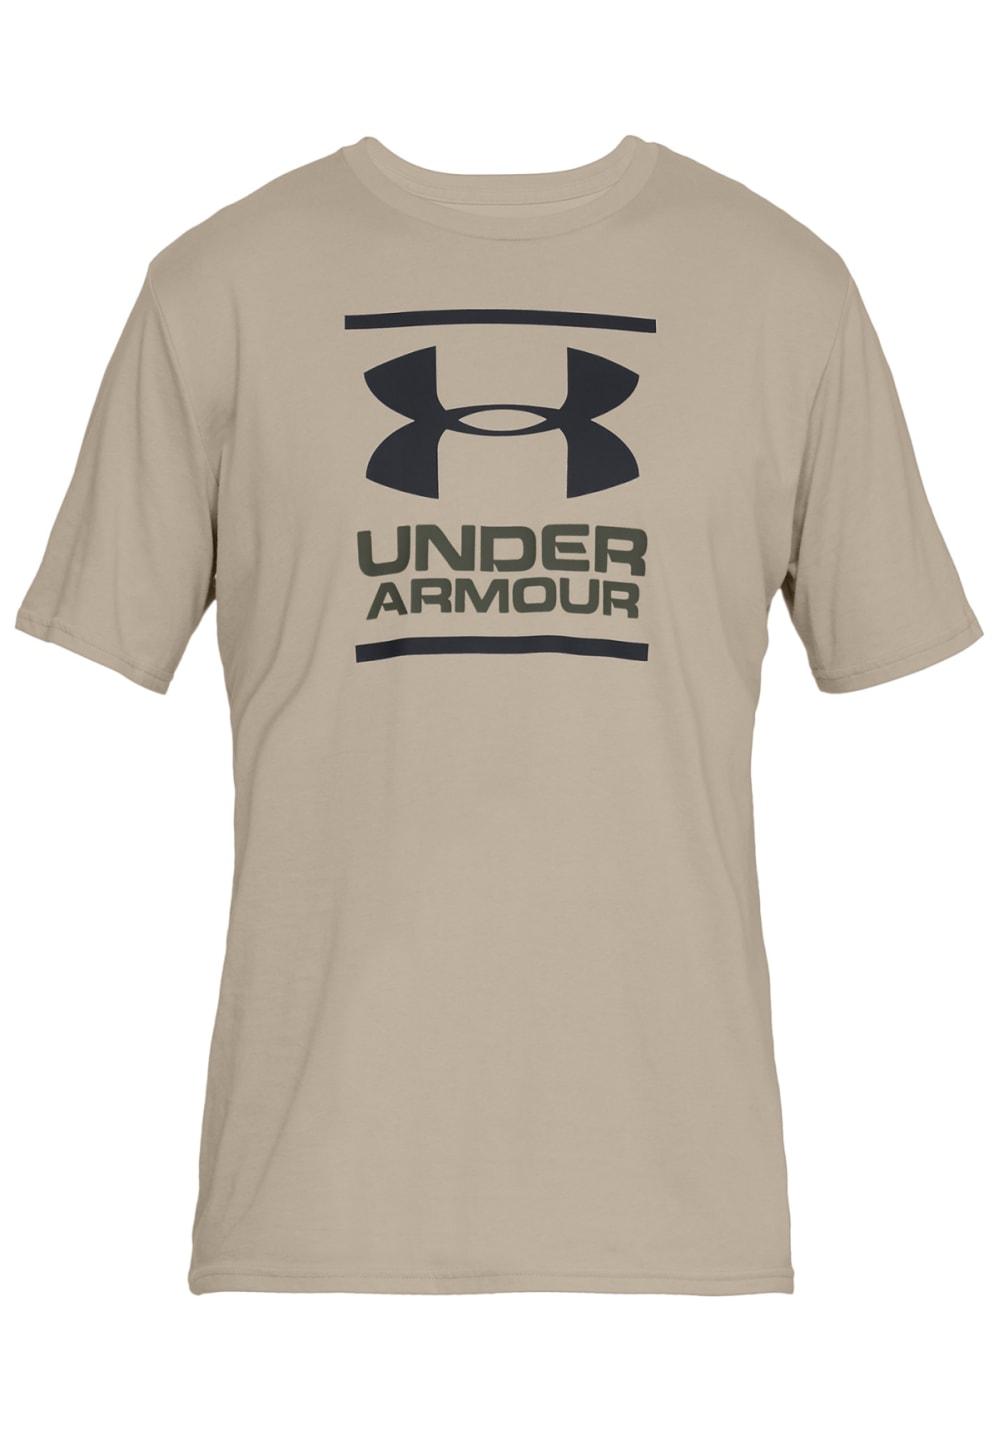 ddafcf81 Under Armour Gl Foundation Short Sleeve Tee - T-Shirts for Men - Beige